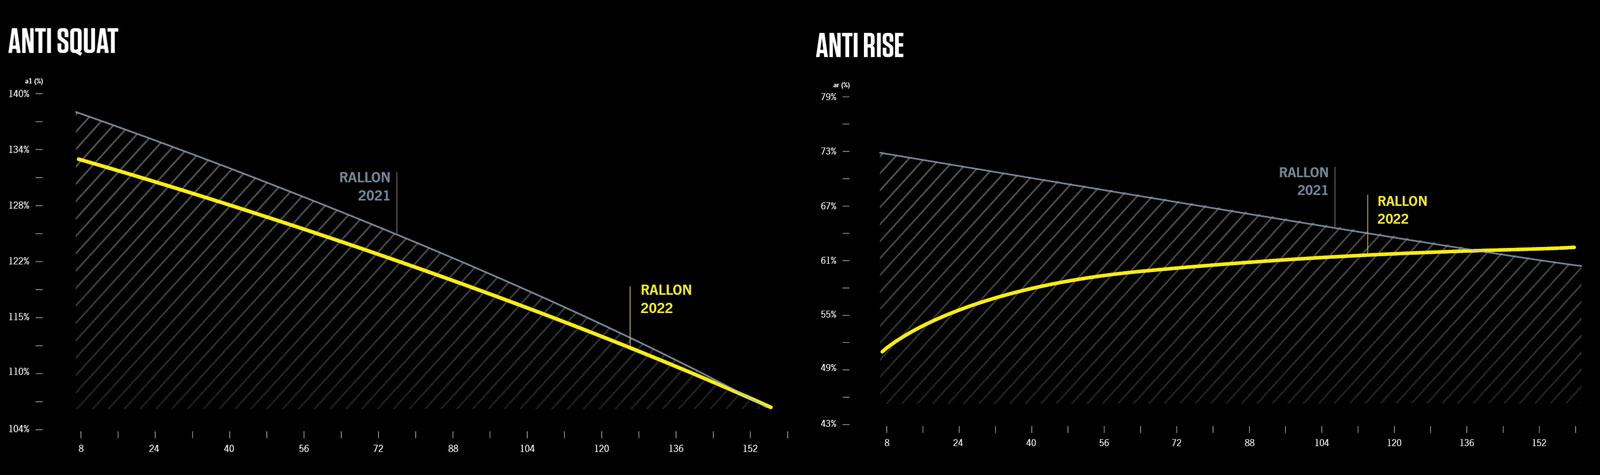 2022 orbea rallon anti-rise anti-squat versus 2020 frame comparison